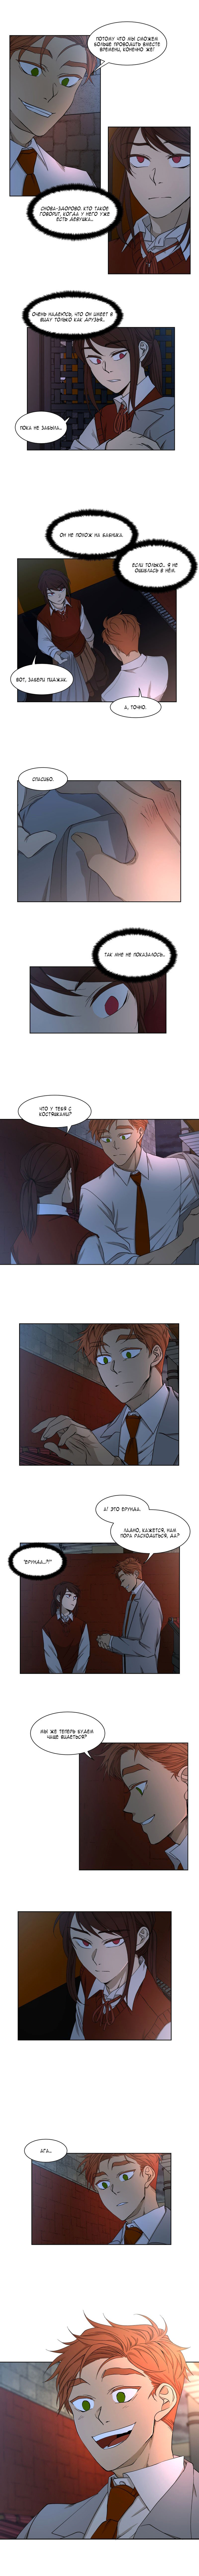 Манга Я люблю Ю / I love Yoo  - Том 1 Глава 28 Страница 6